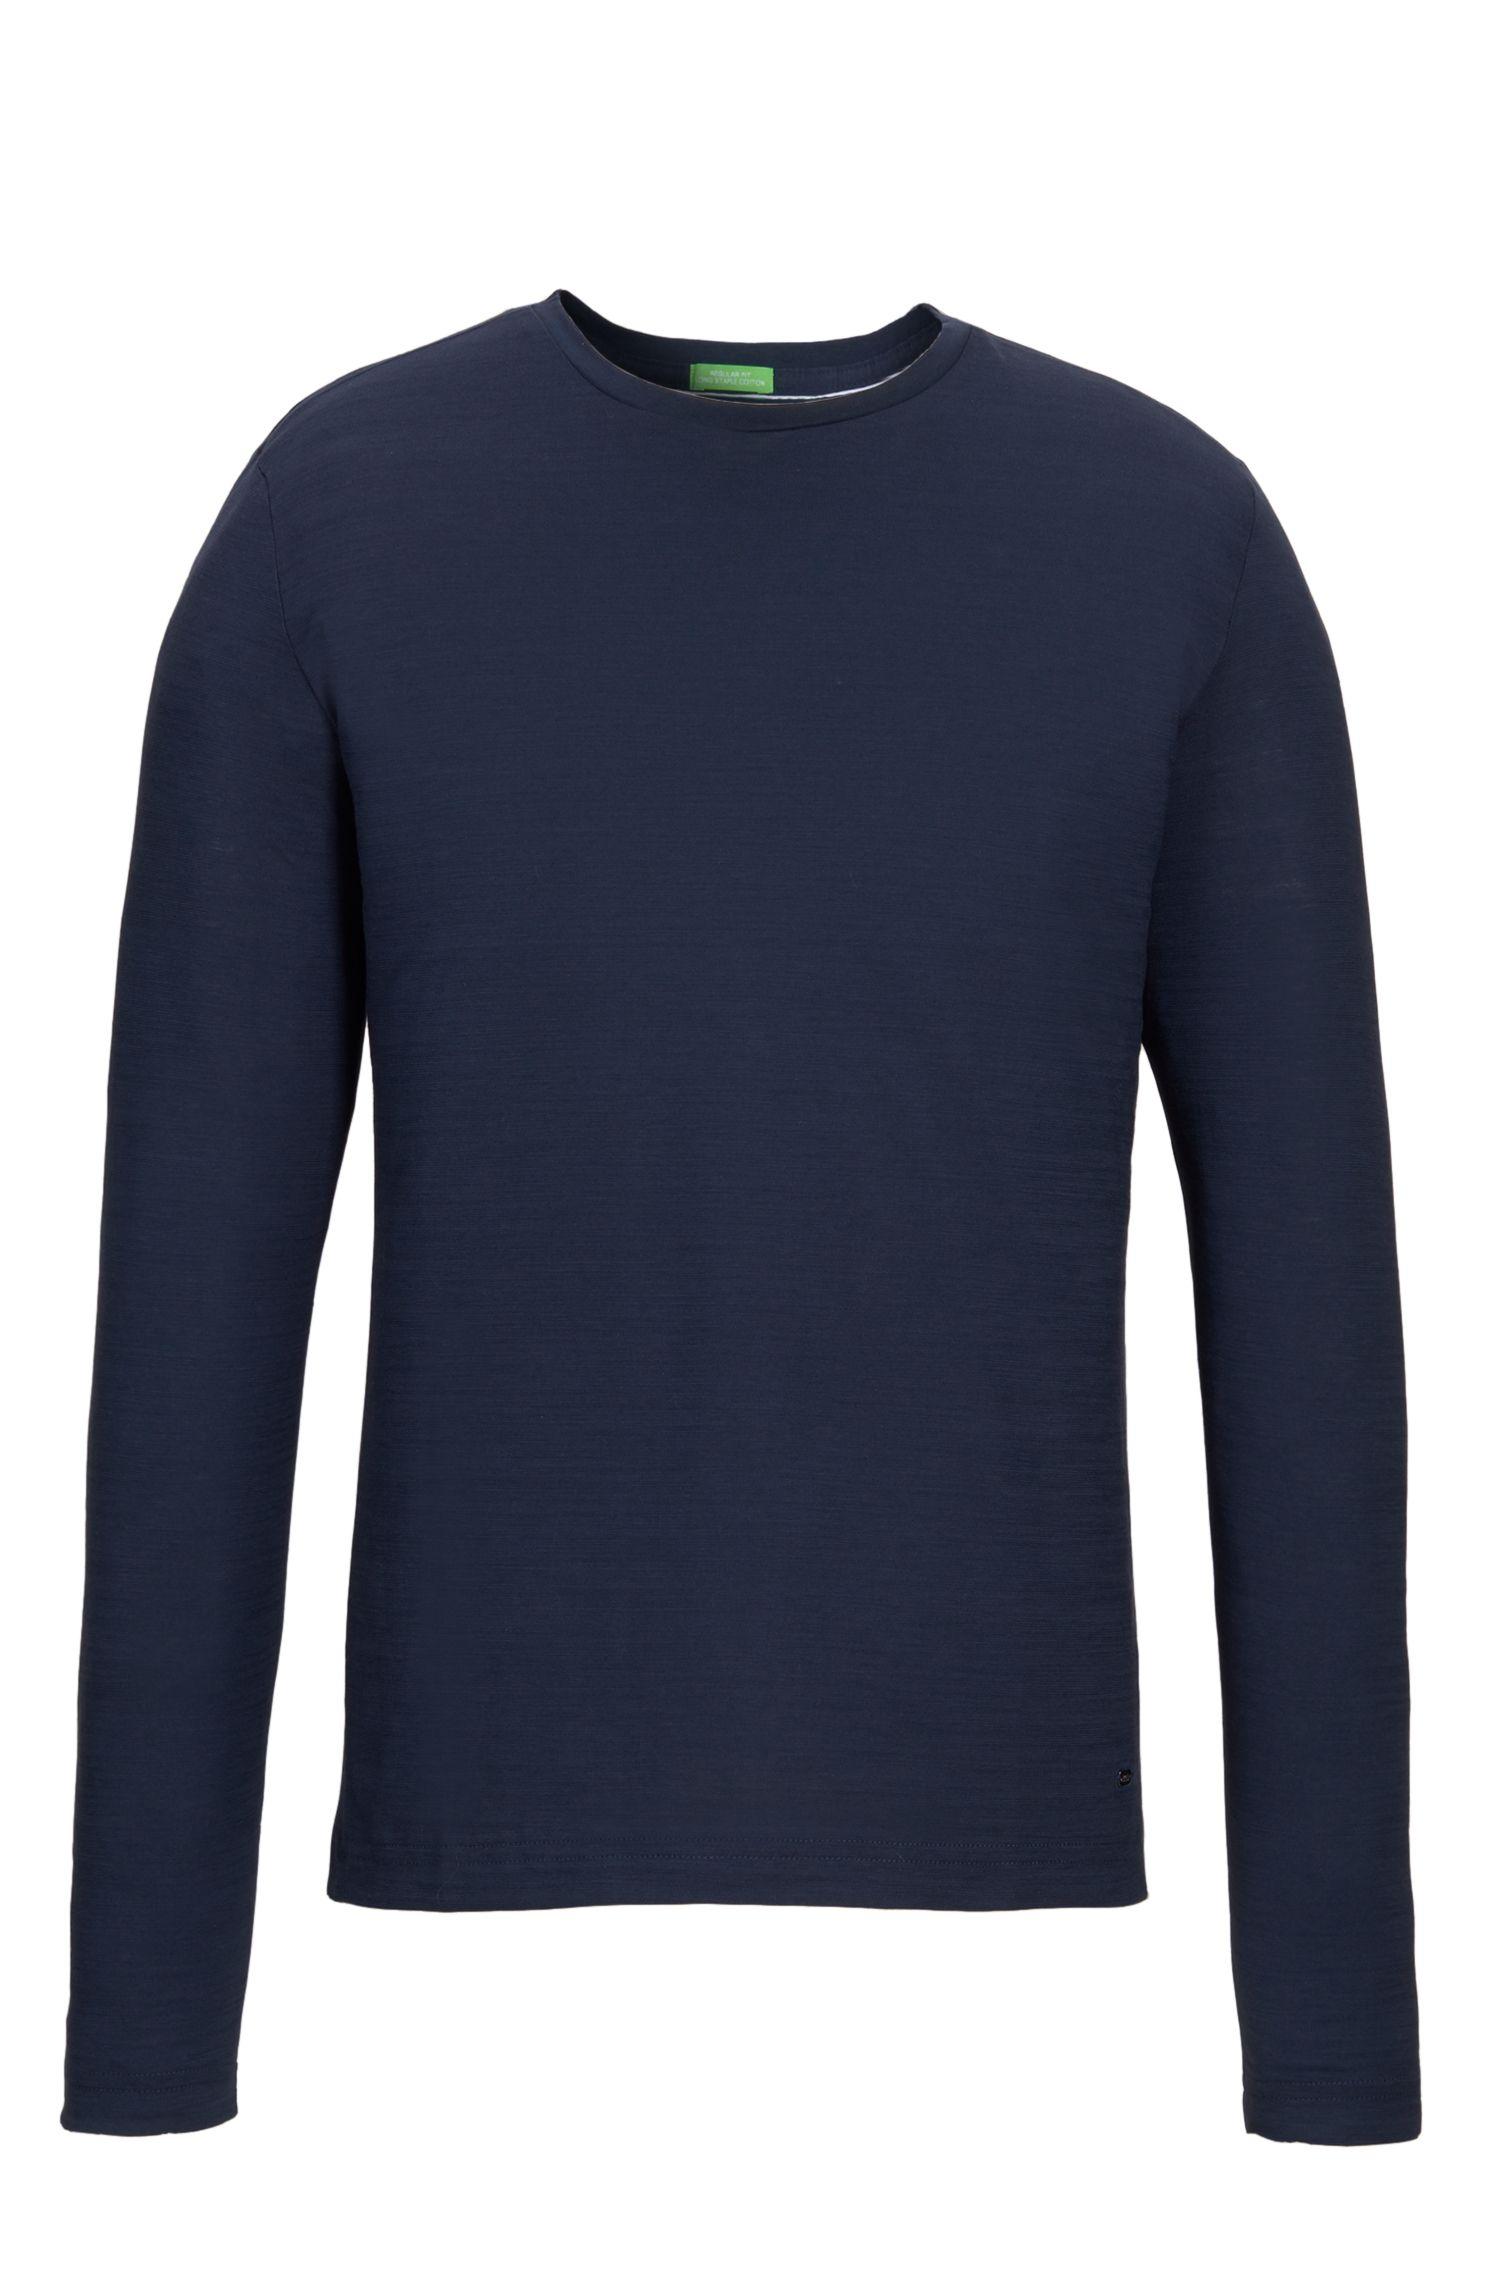 Cotton Long Sleeve T-Shirt | Sessari